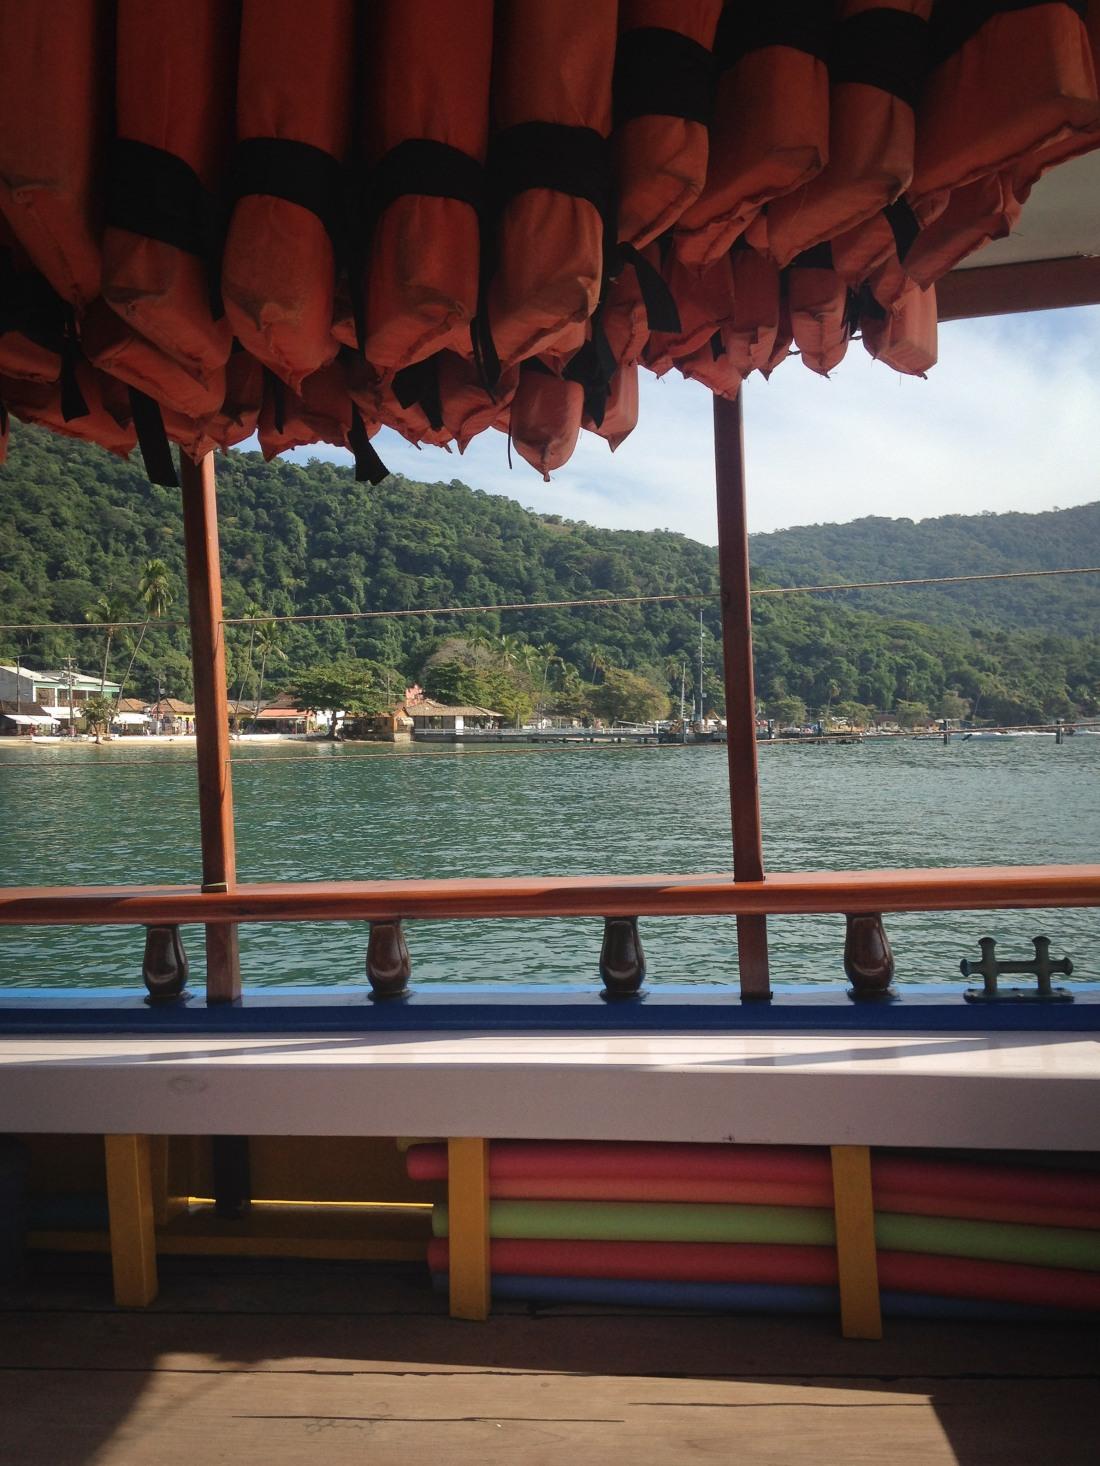 ilha-grande-rj-viagem-blog-coamotta-5